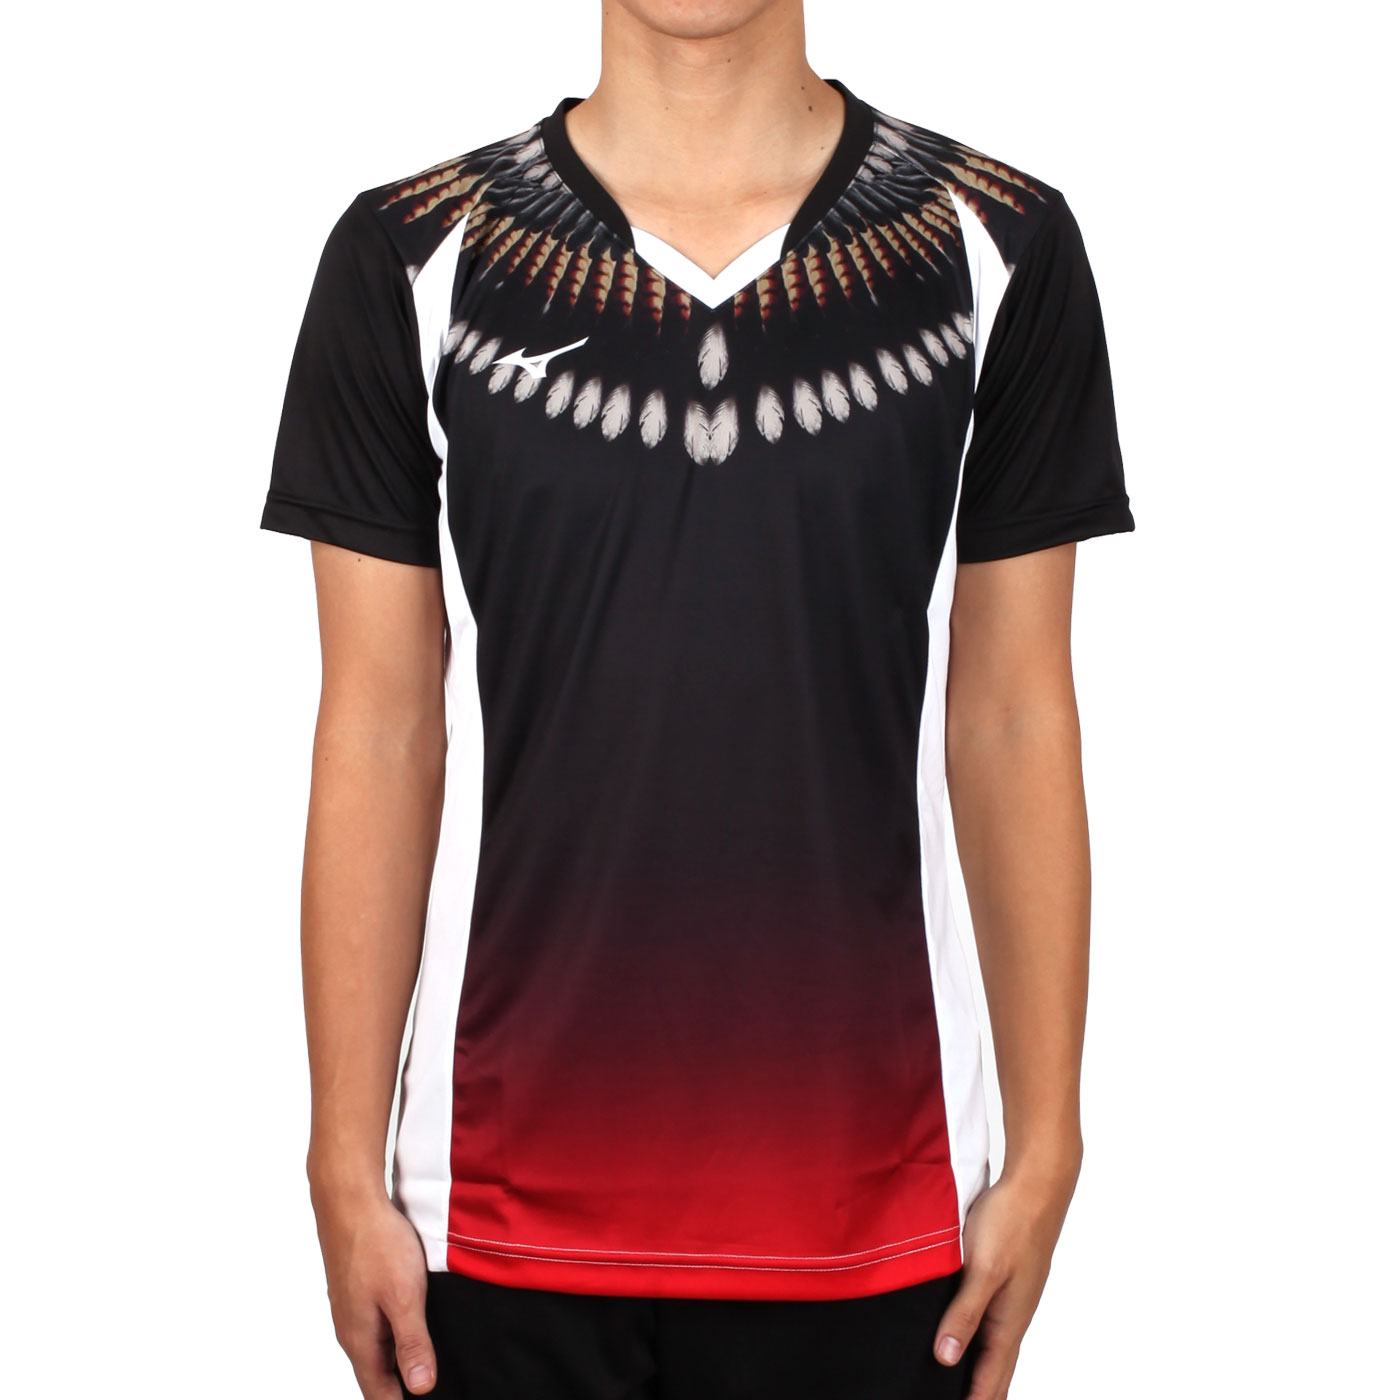 MIZUNO 男排球短袖上衣(2017企業排球聯賽) V2TA7A3081D - 黑紅